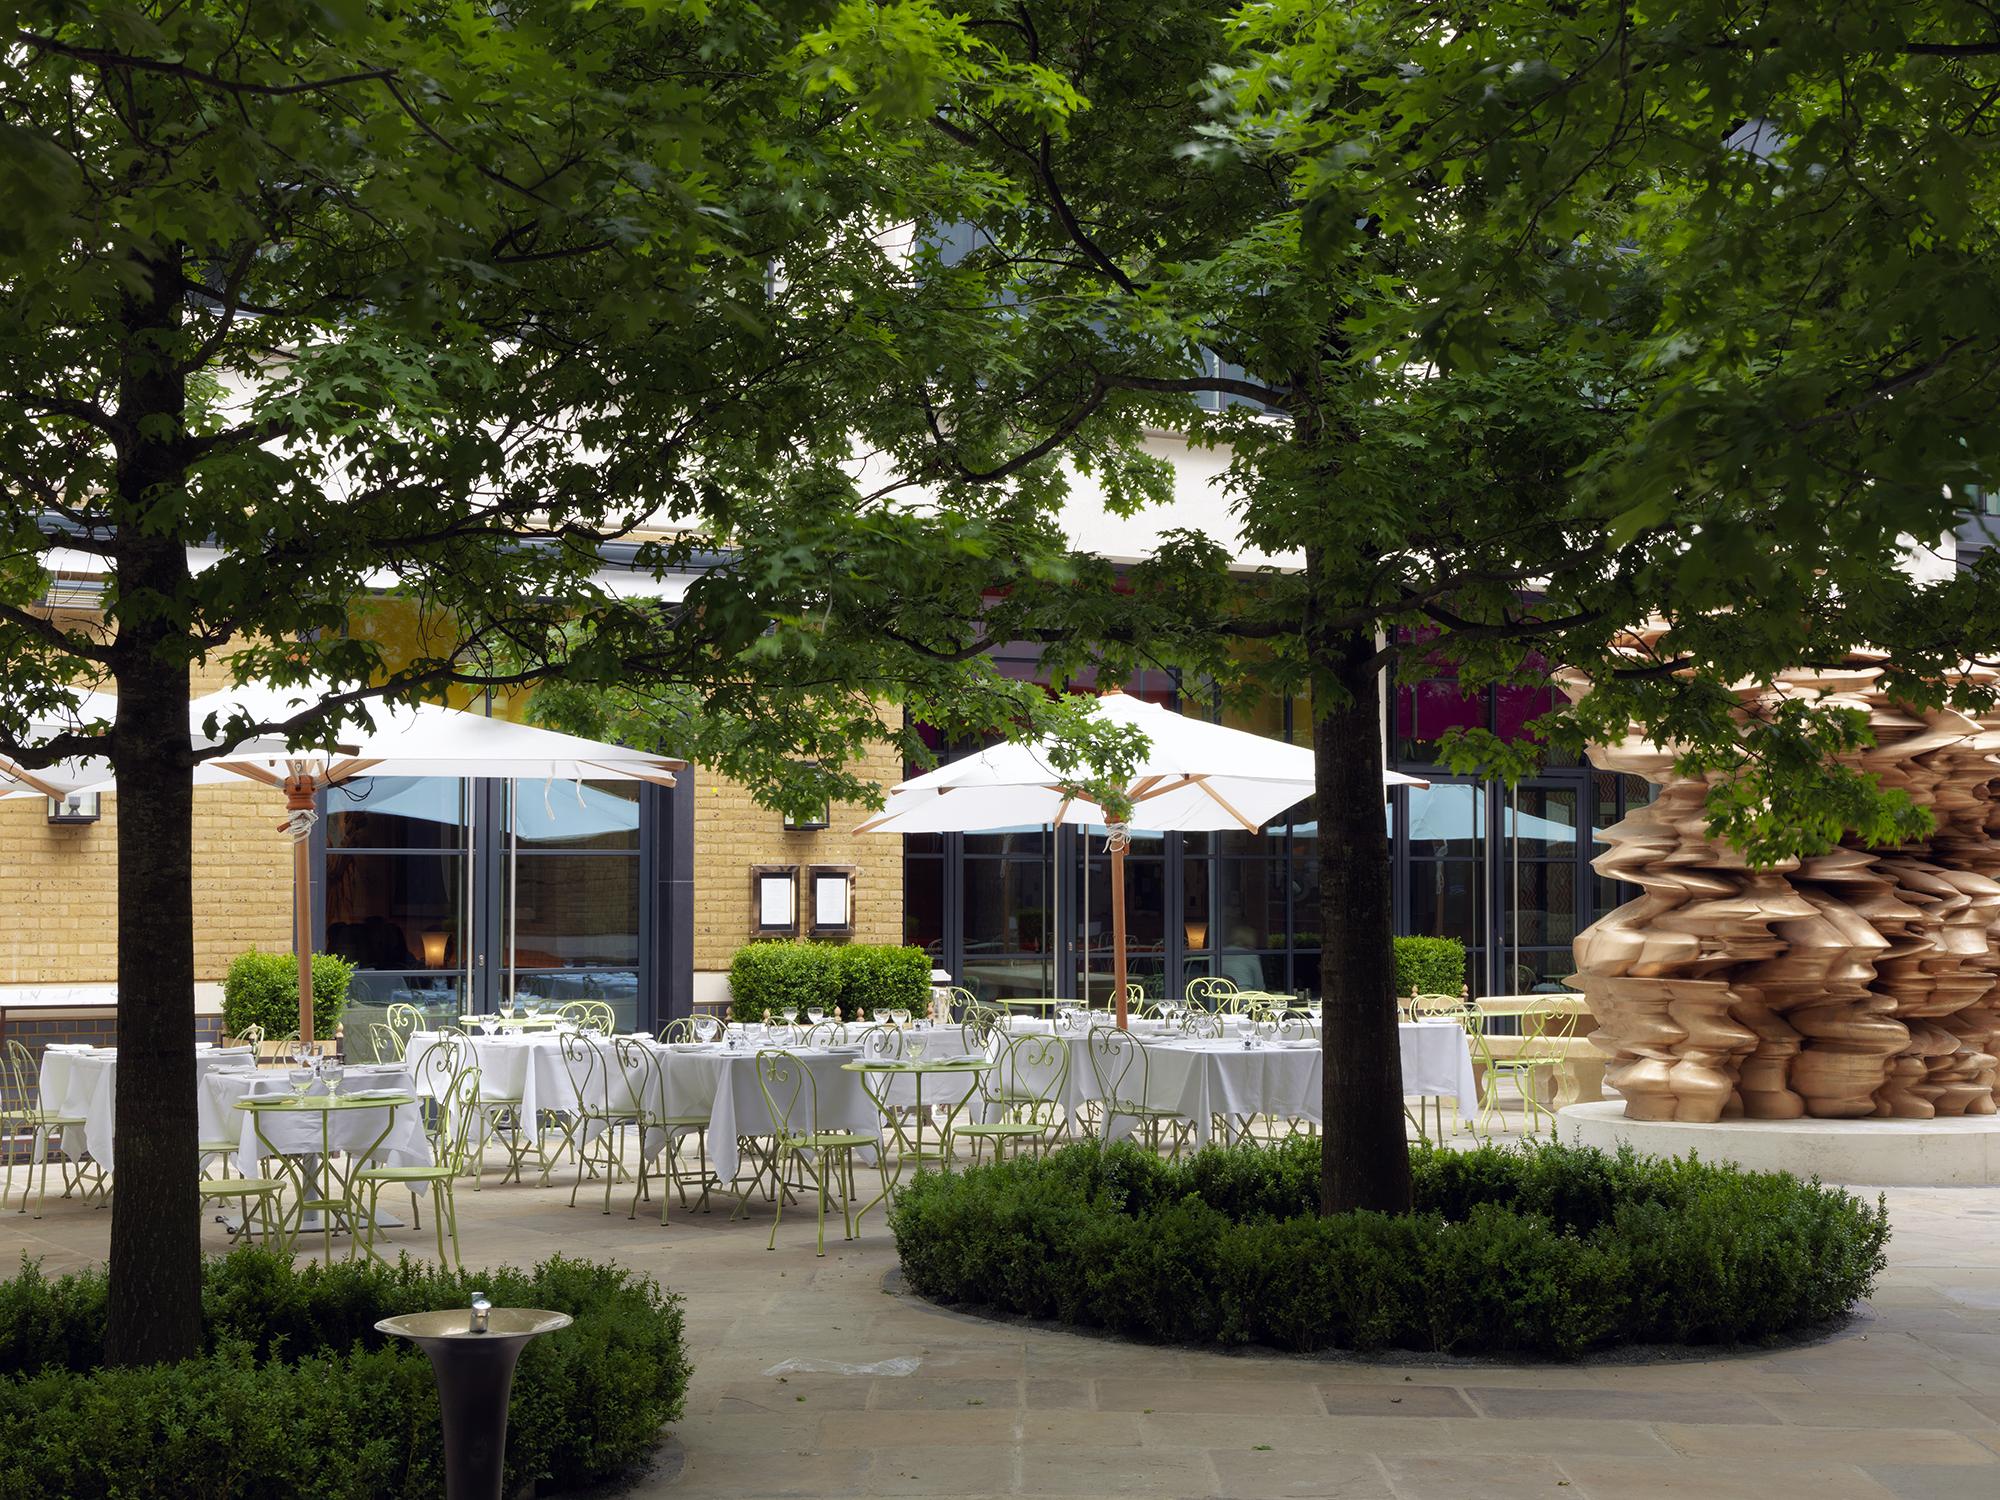 Ham Yard Courtyard Firmdale Top Ten Things